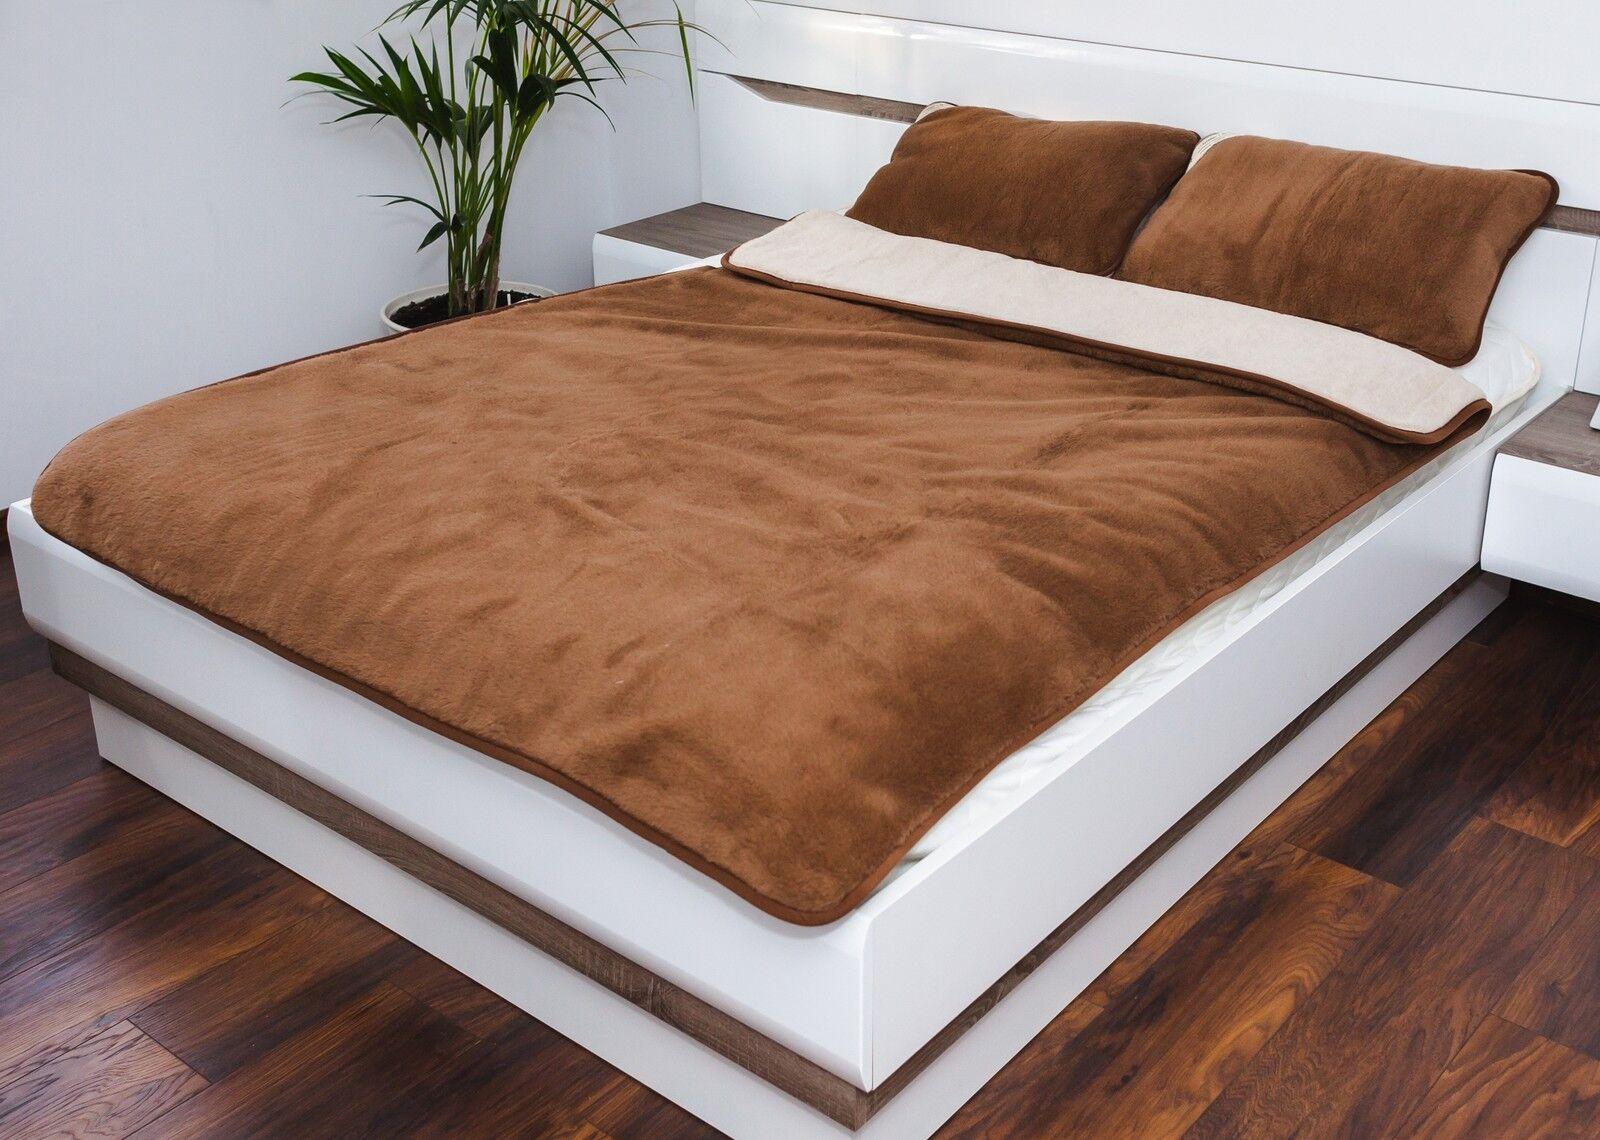 exklusiv ber decke kamel 100 merino wool braun kamel bettdecke 160 x 200 cm ebay. Black Bedroom Furniture Sets. Home Design Ideas